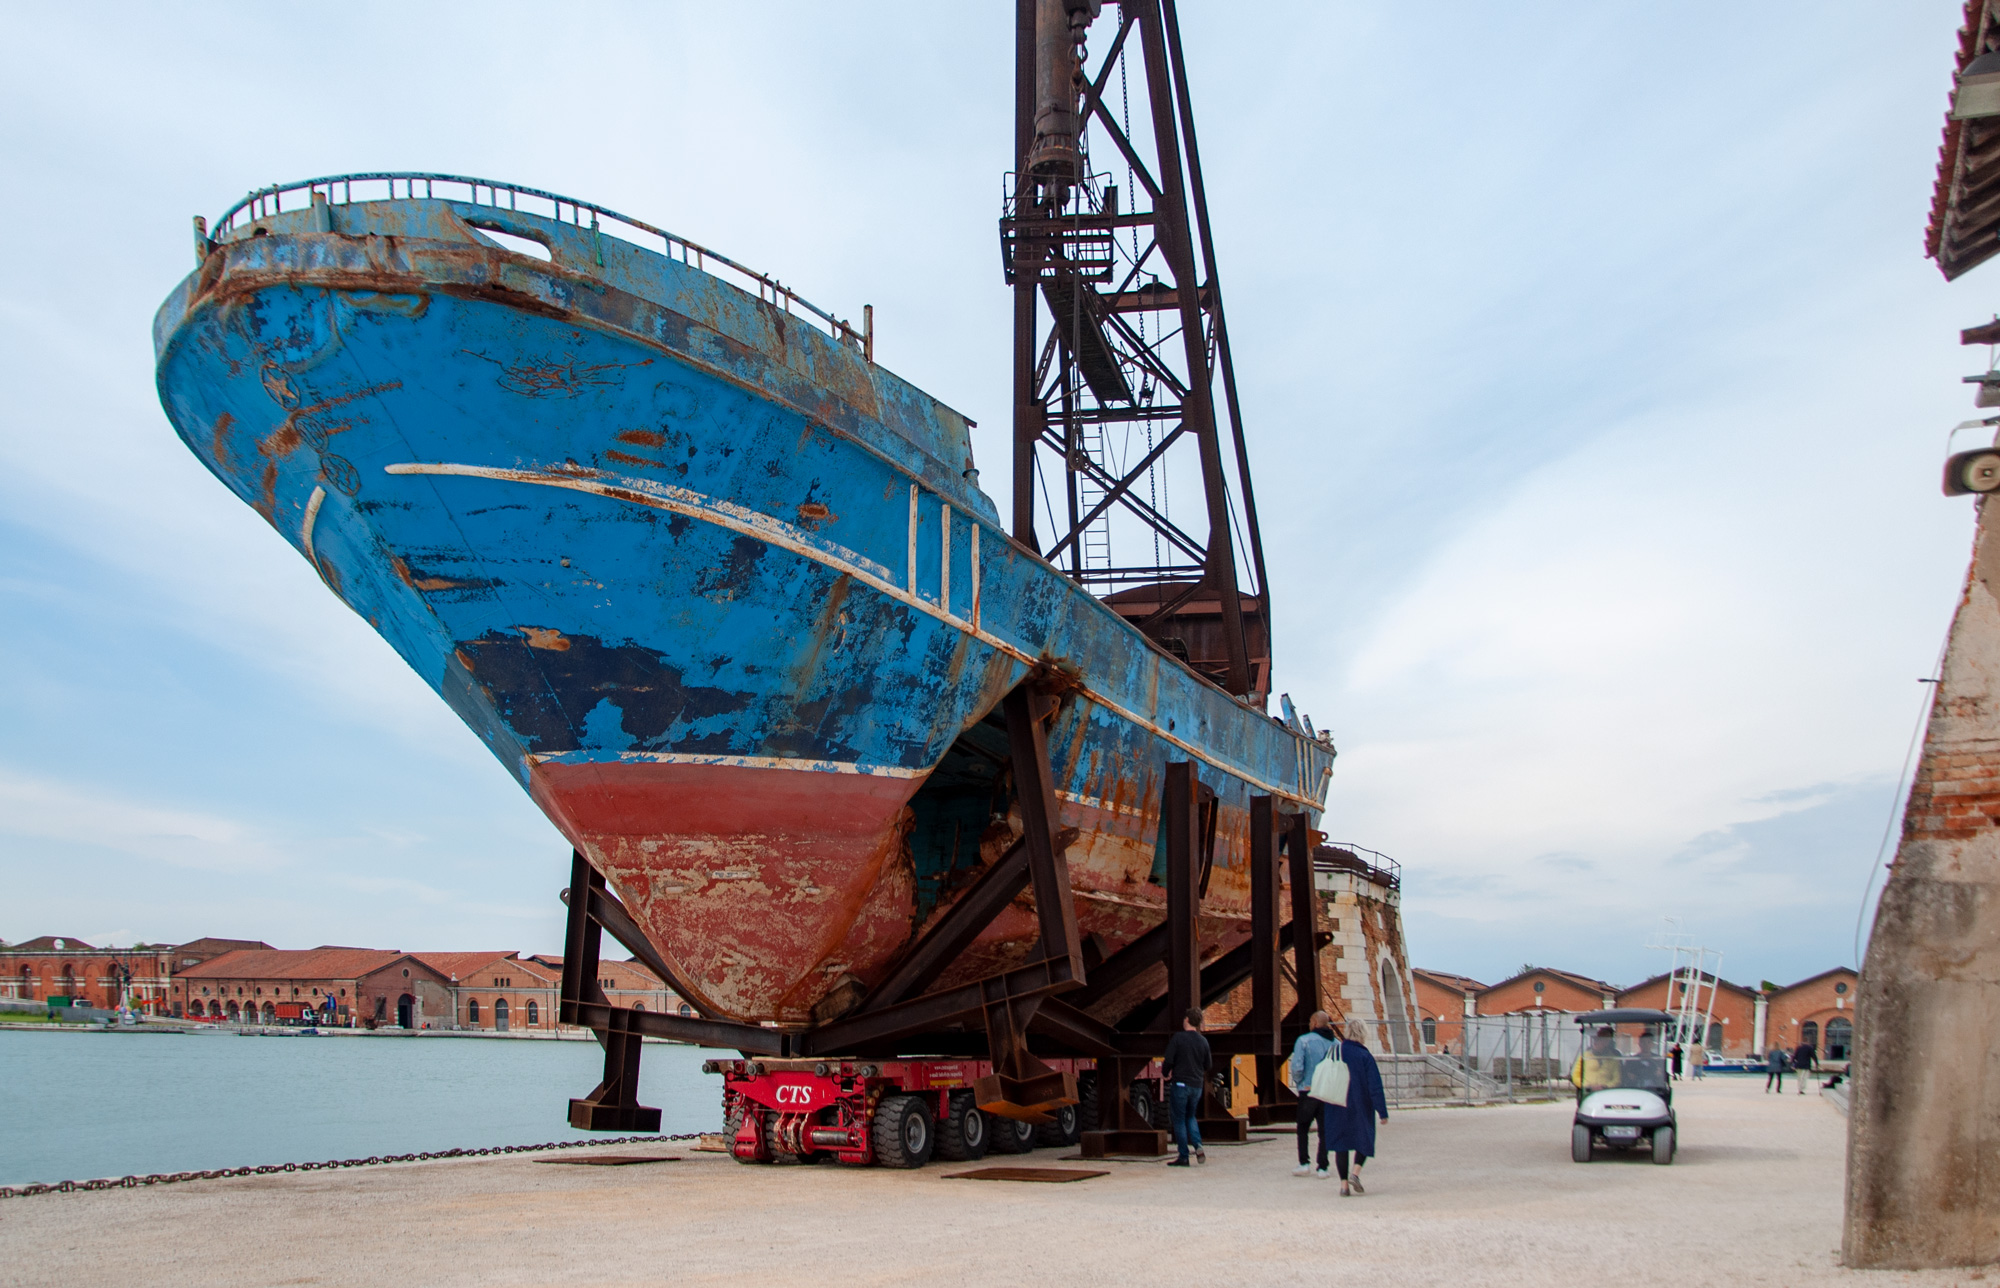 Christoph Büchel, Barca Nostra, Venezia, 2019. Ph. Irene Fanizza